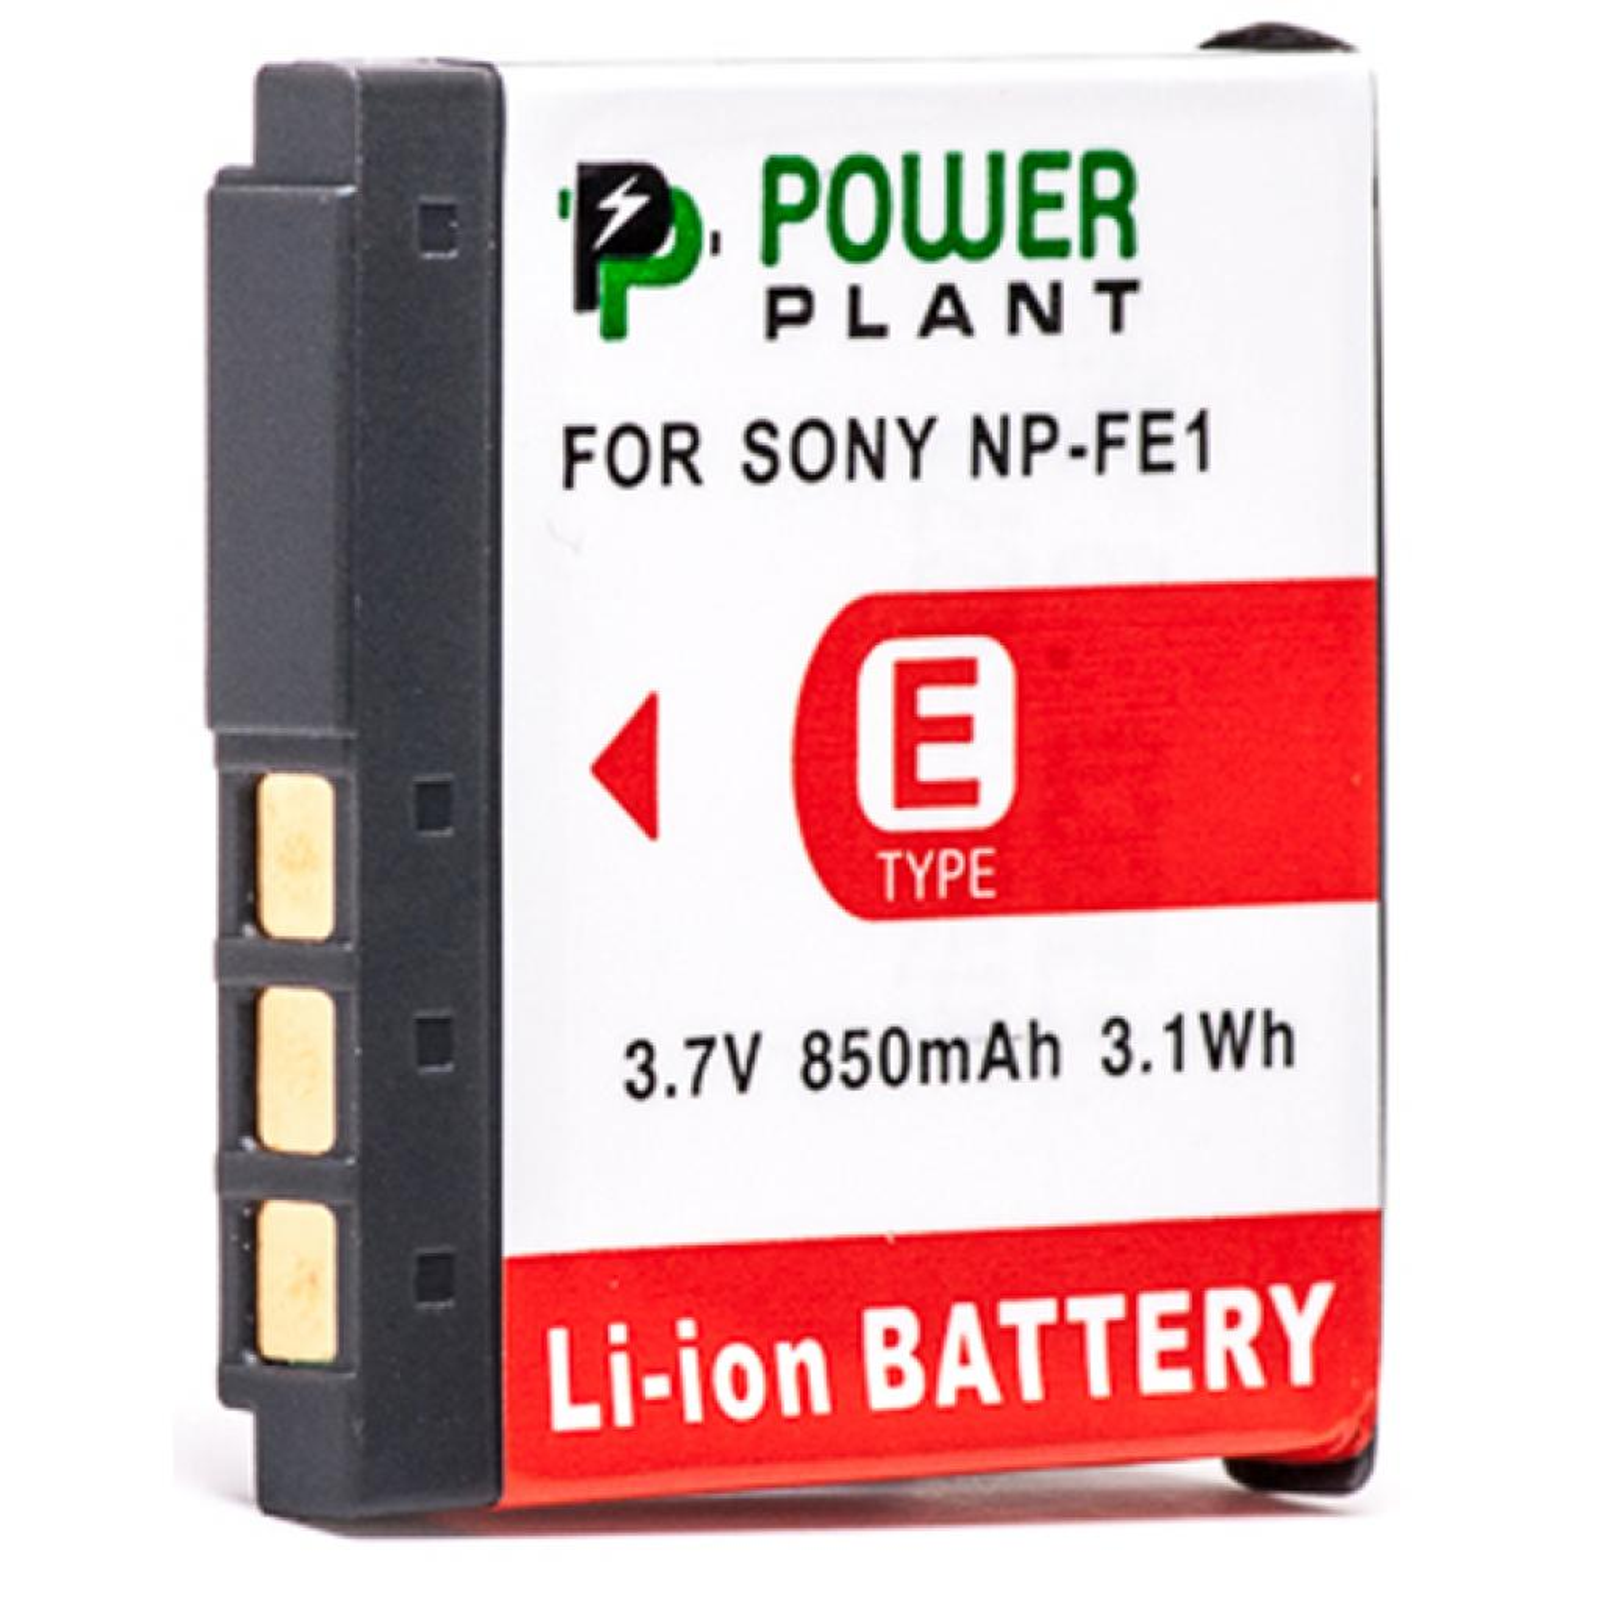 Аккумулятор к фото/видео PowerPlant Sony NP-FE1 (DV00DV1062)